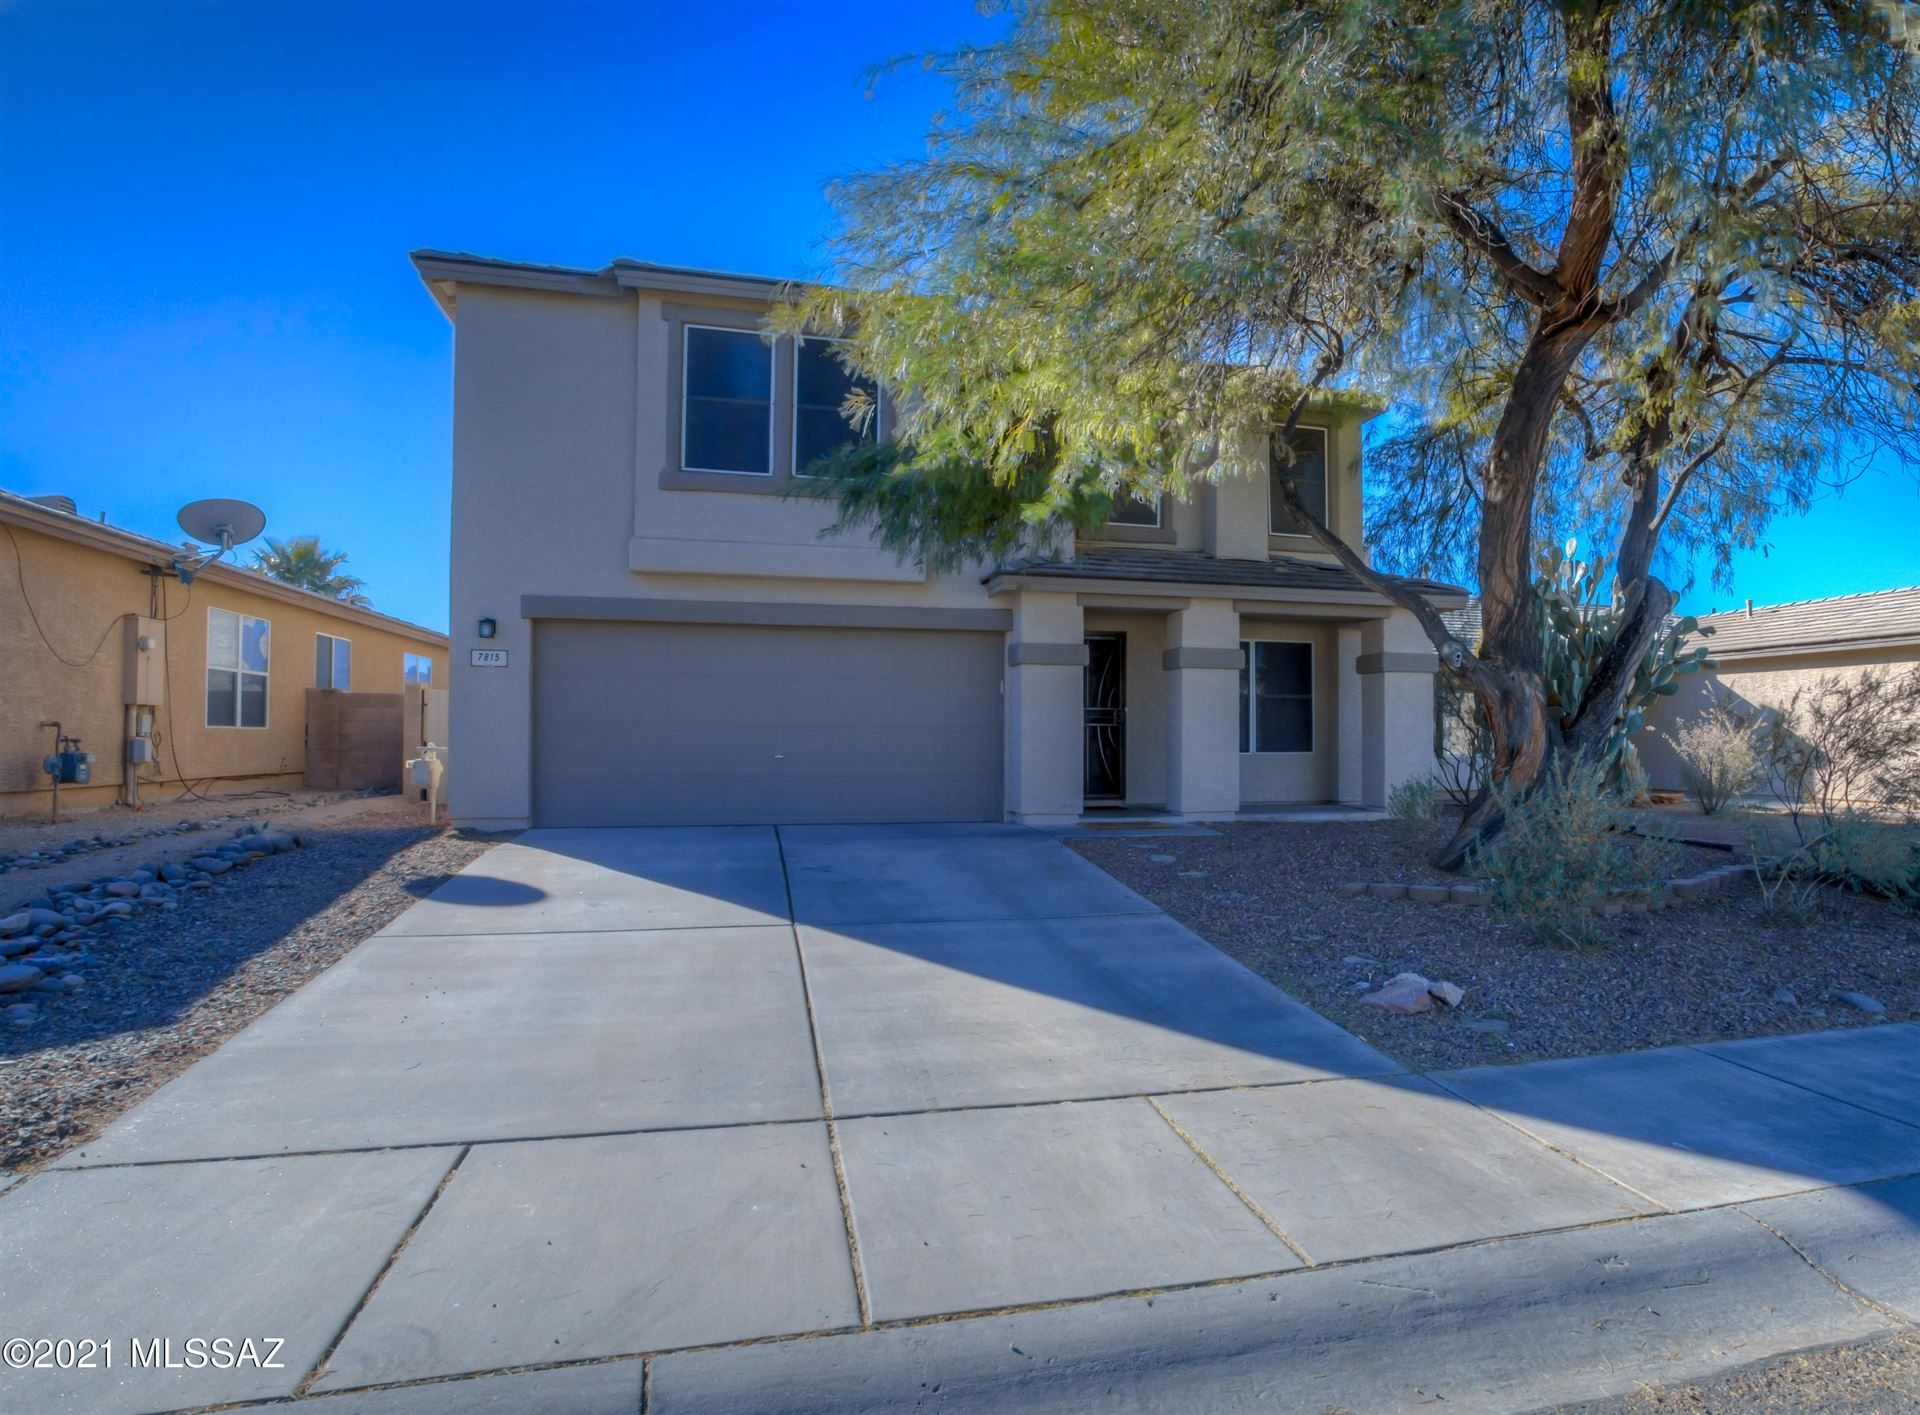 7815 W Lees Ferry Court, Tucson, AZ 85743 - MLS#: 22100322